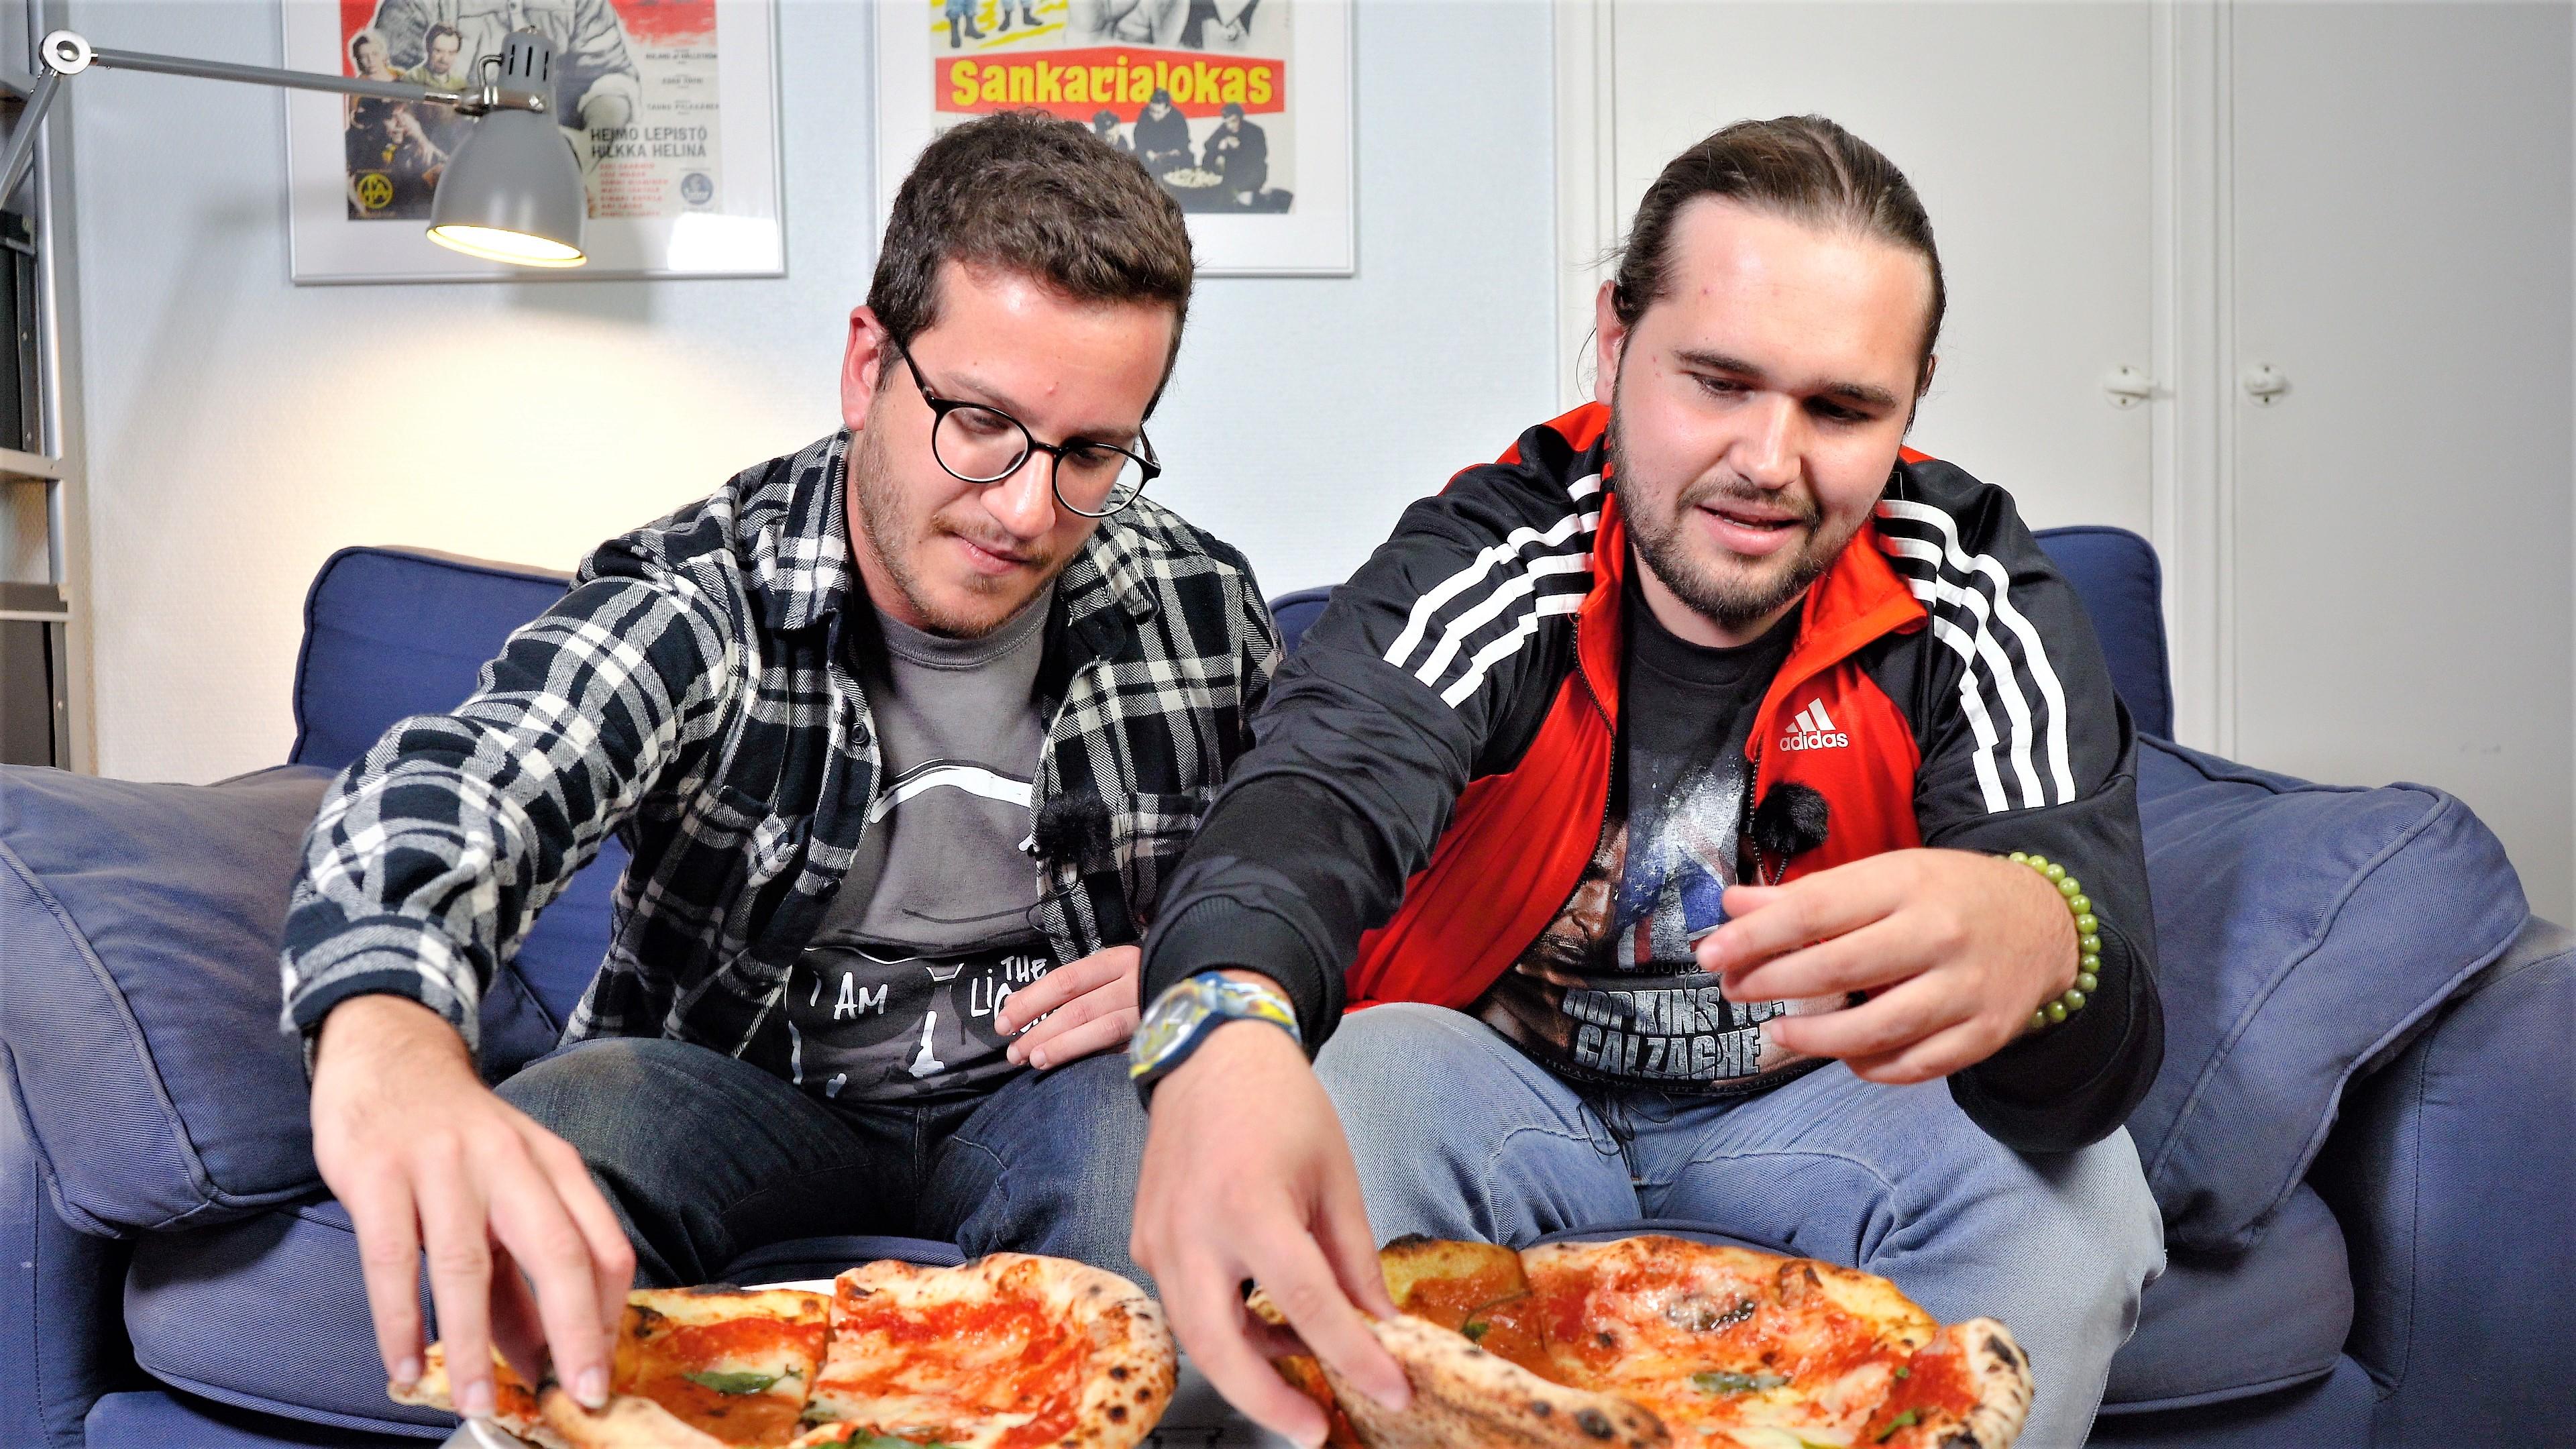 Helsingin paras italialainen pizza?   Helsingin ravintolat